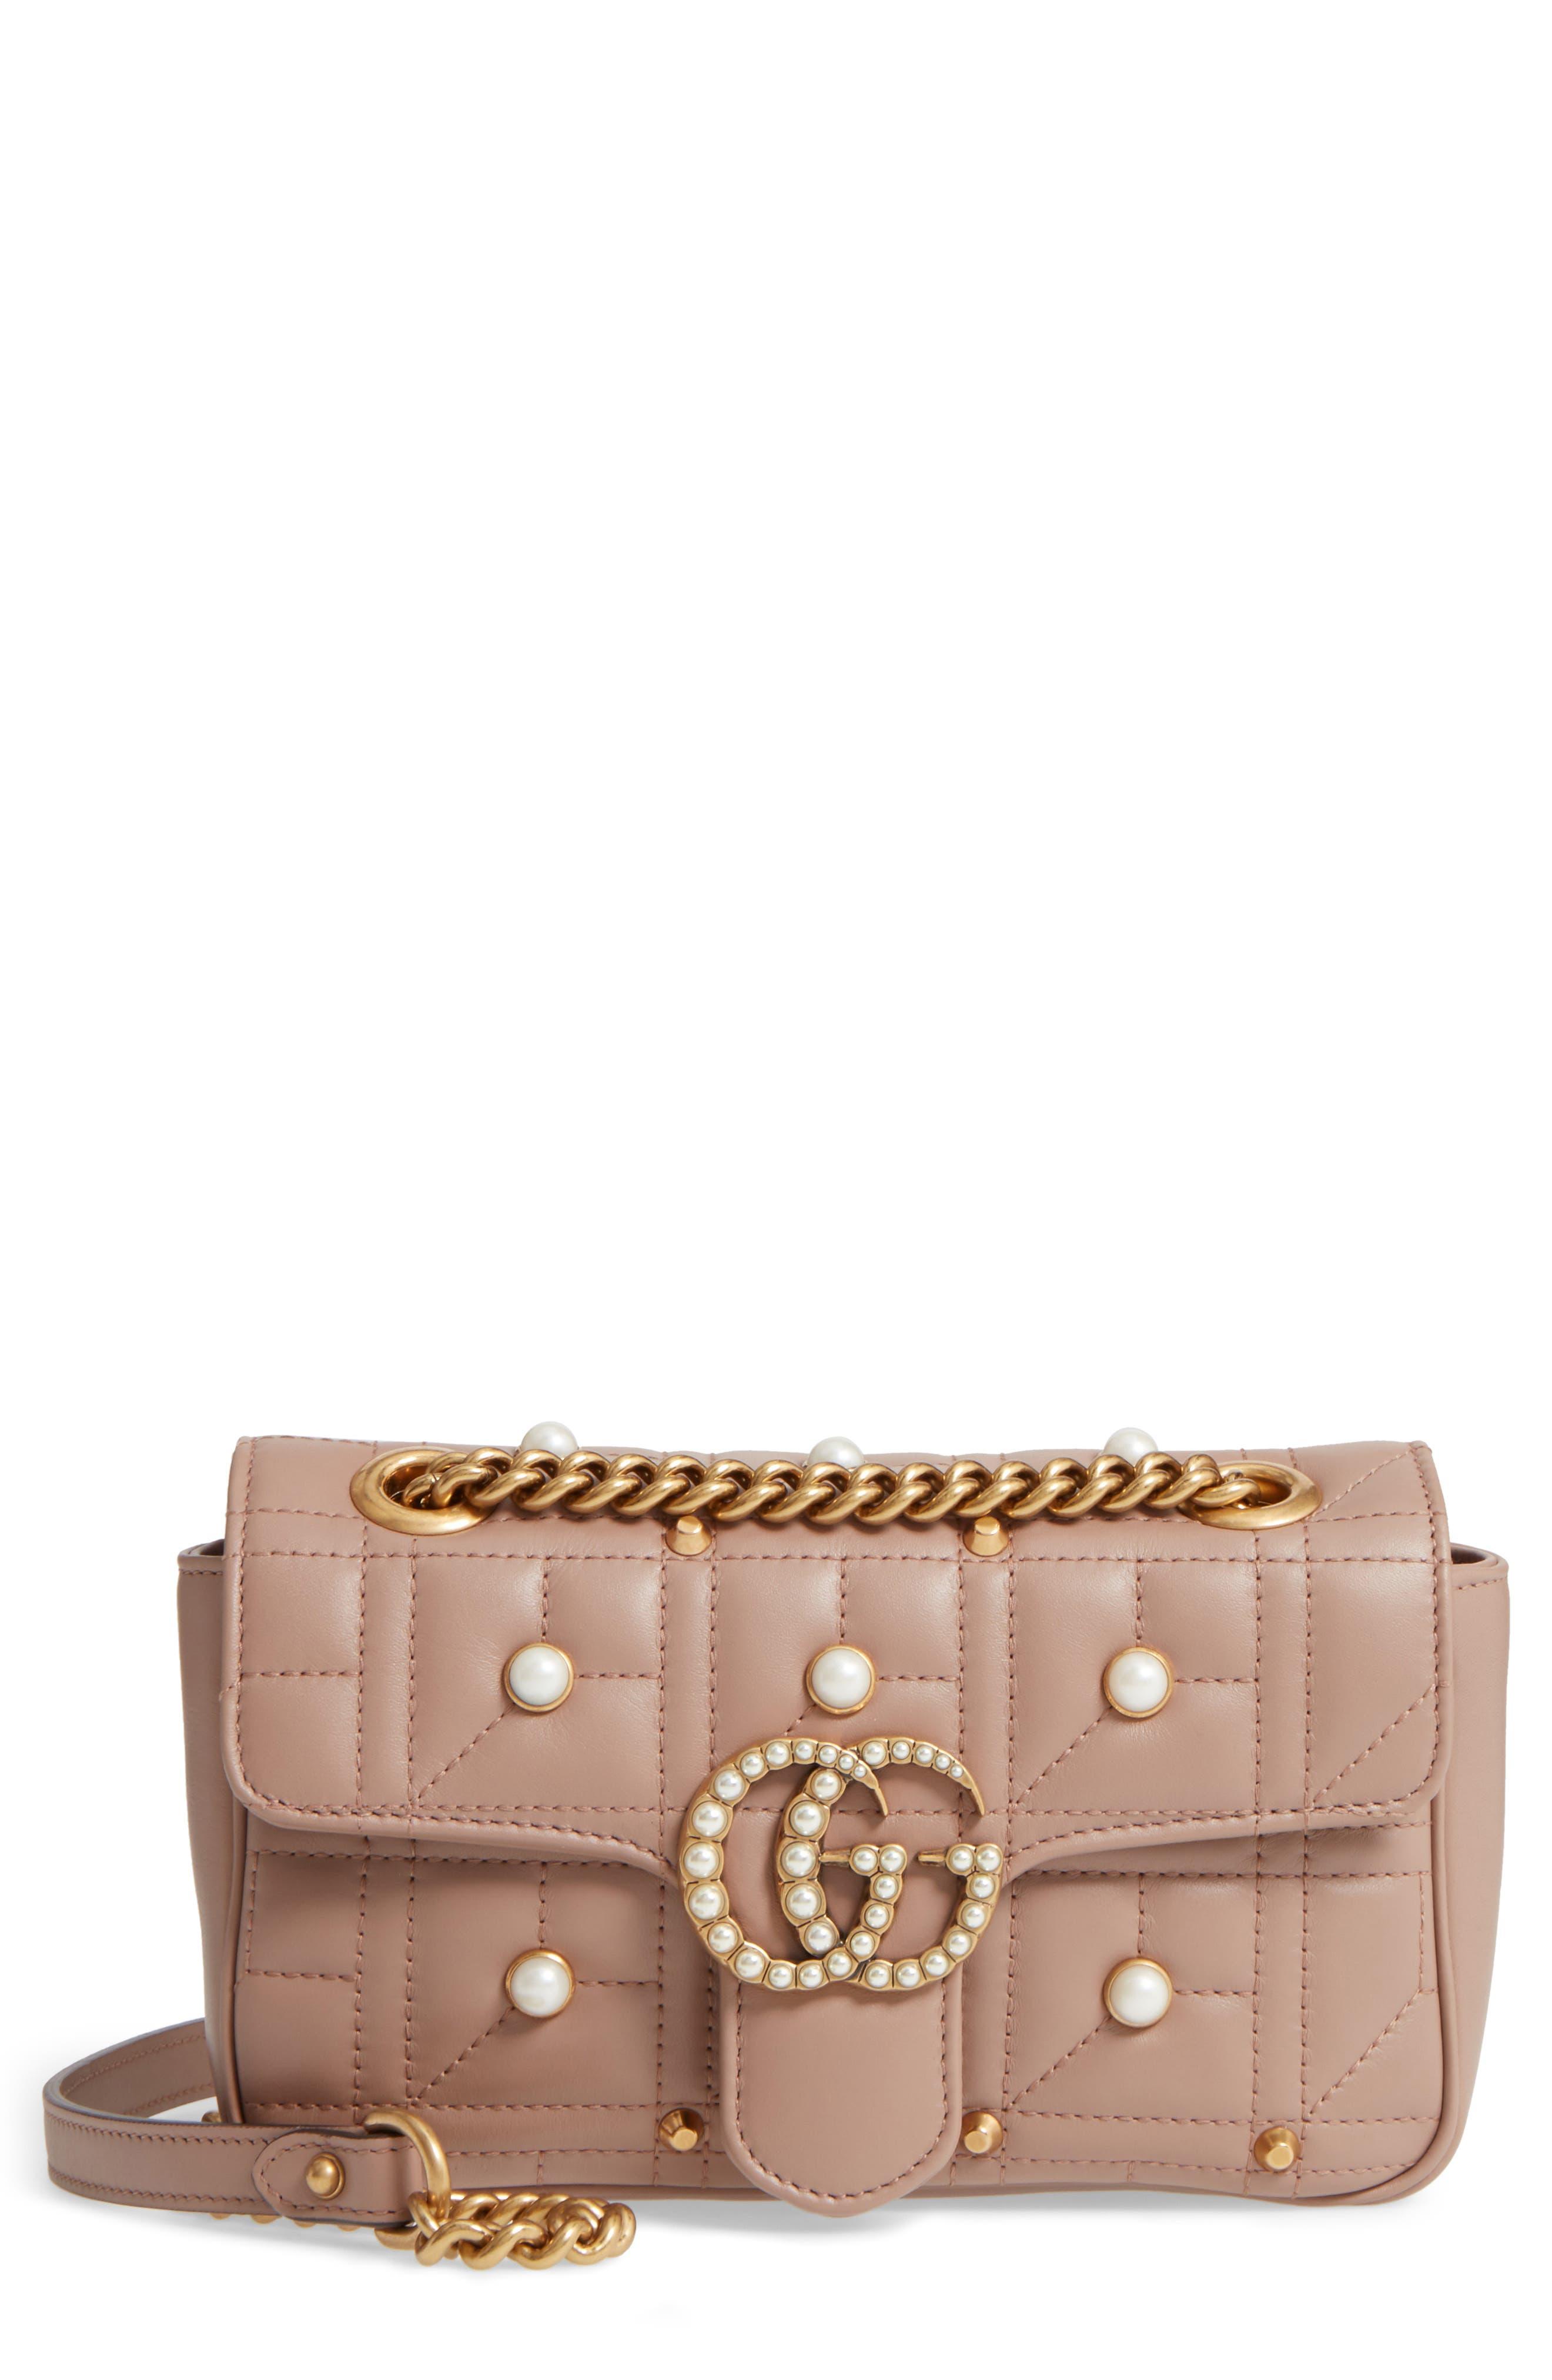 GUCCI, Mini GG Marmont 2.0 Imitation Pearl Logo Matelassé Leather Shoulder Bag, Main thumbnail 1, color, 651